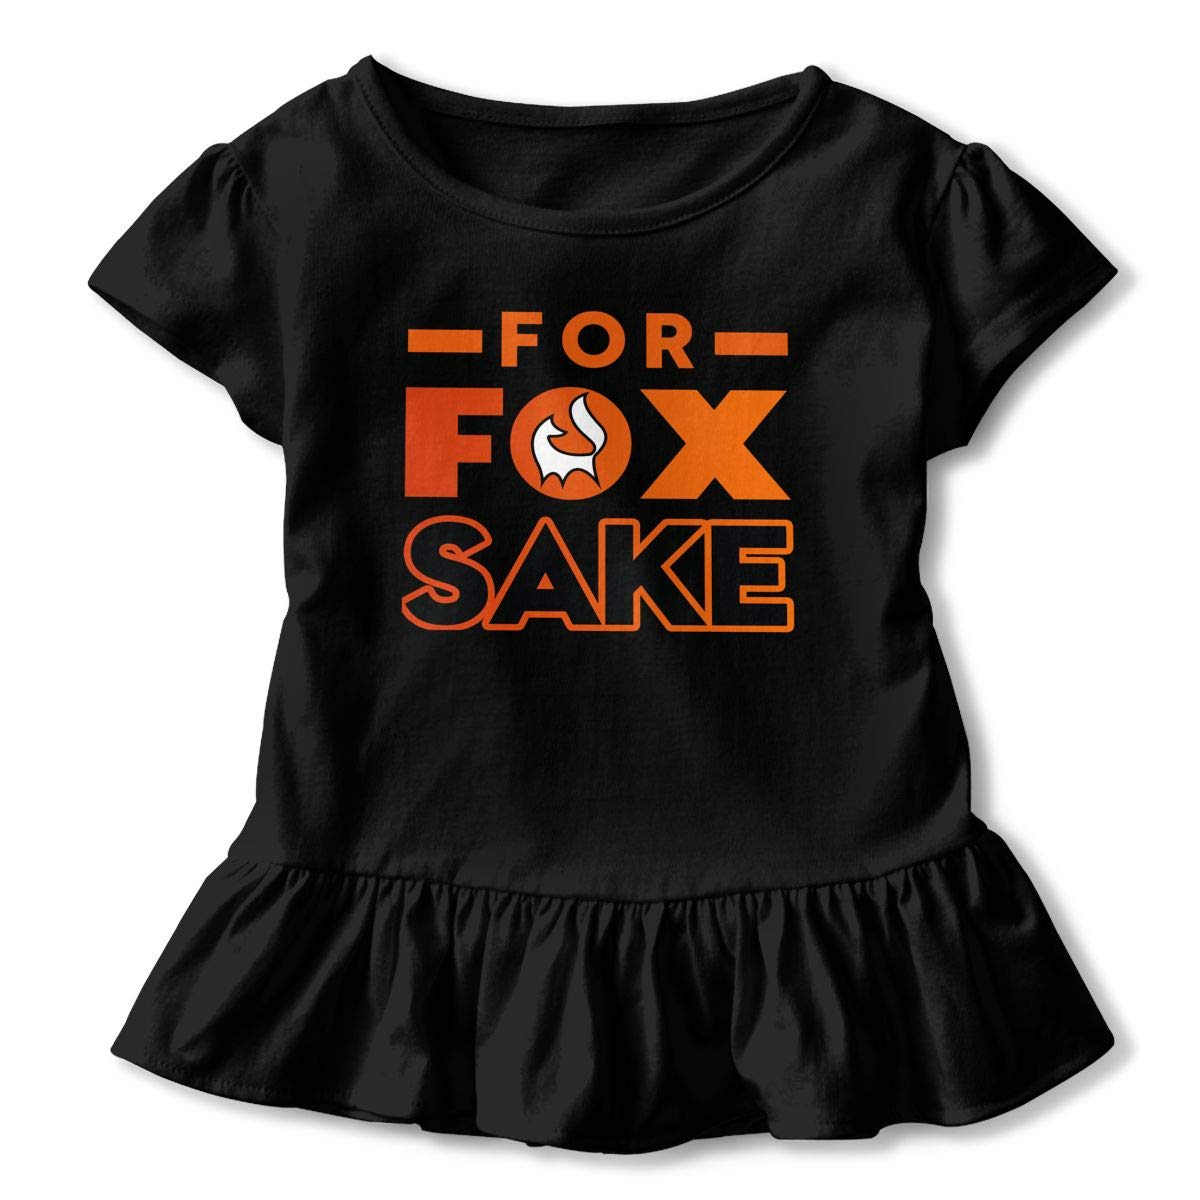 for Fox Sake Baby Girls Fashion Ruffle Top T-Shirt Flounces Dress Toddler Girls Blouse Top